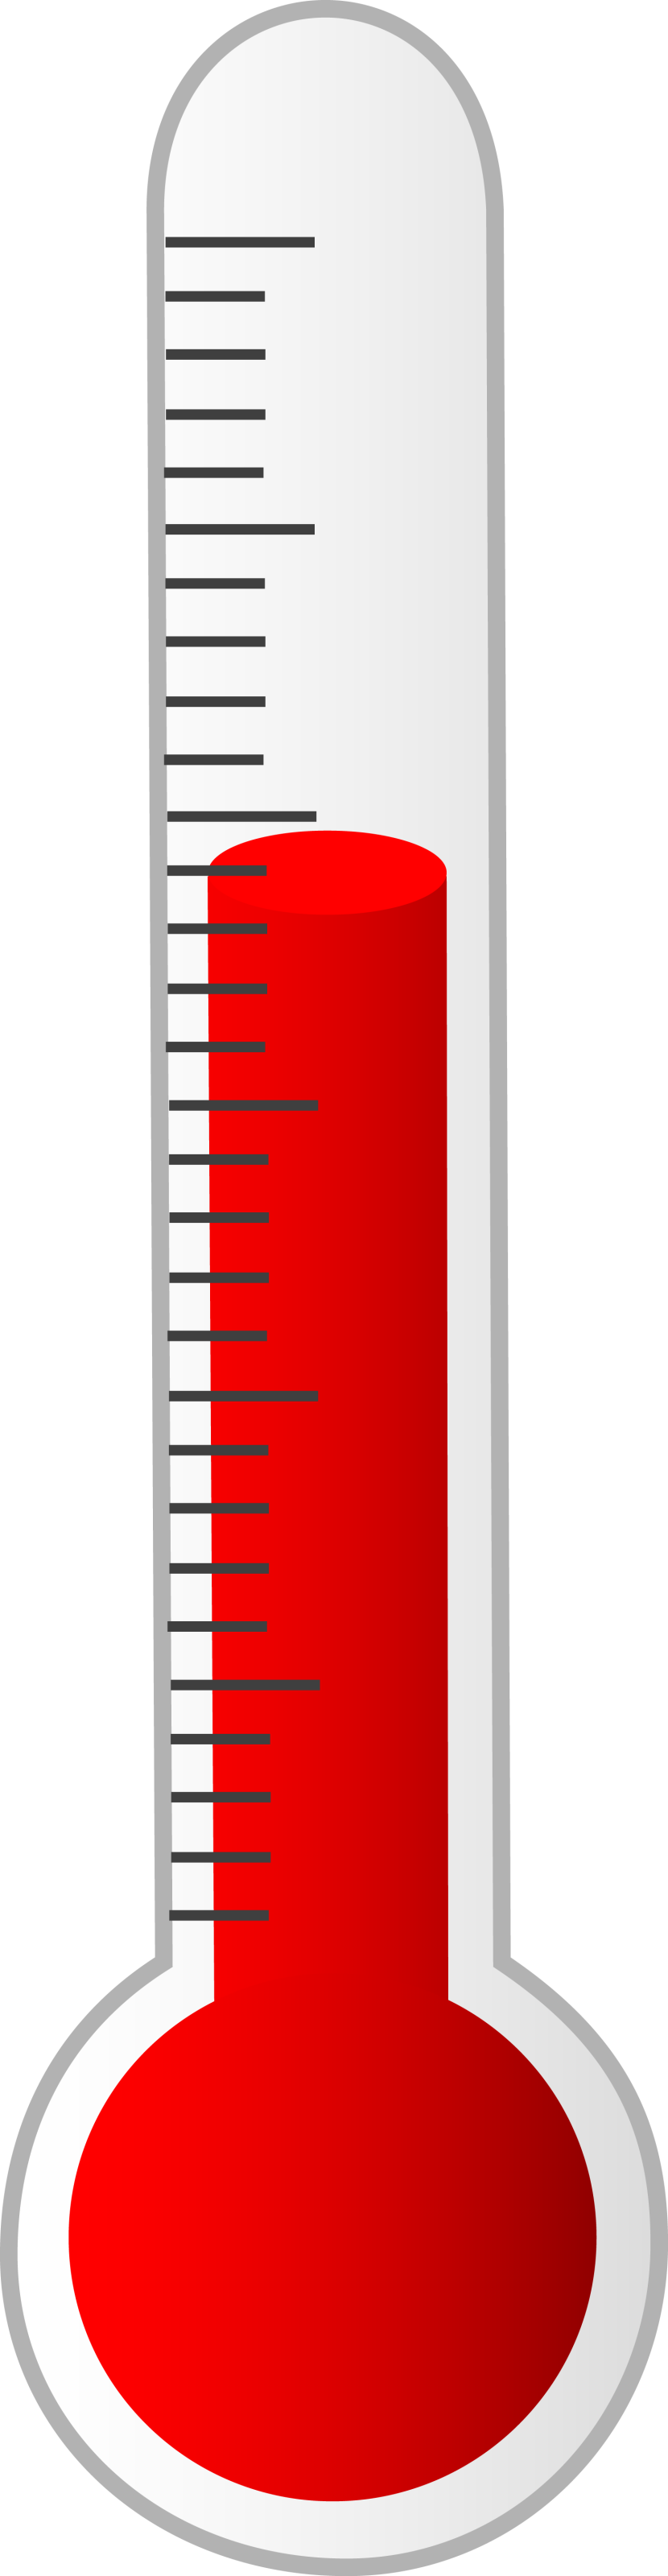 Thermometer clip art 3